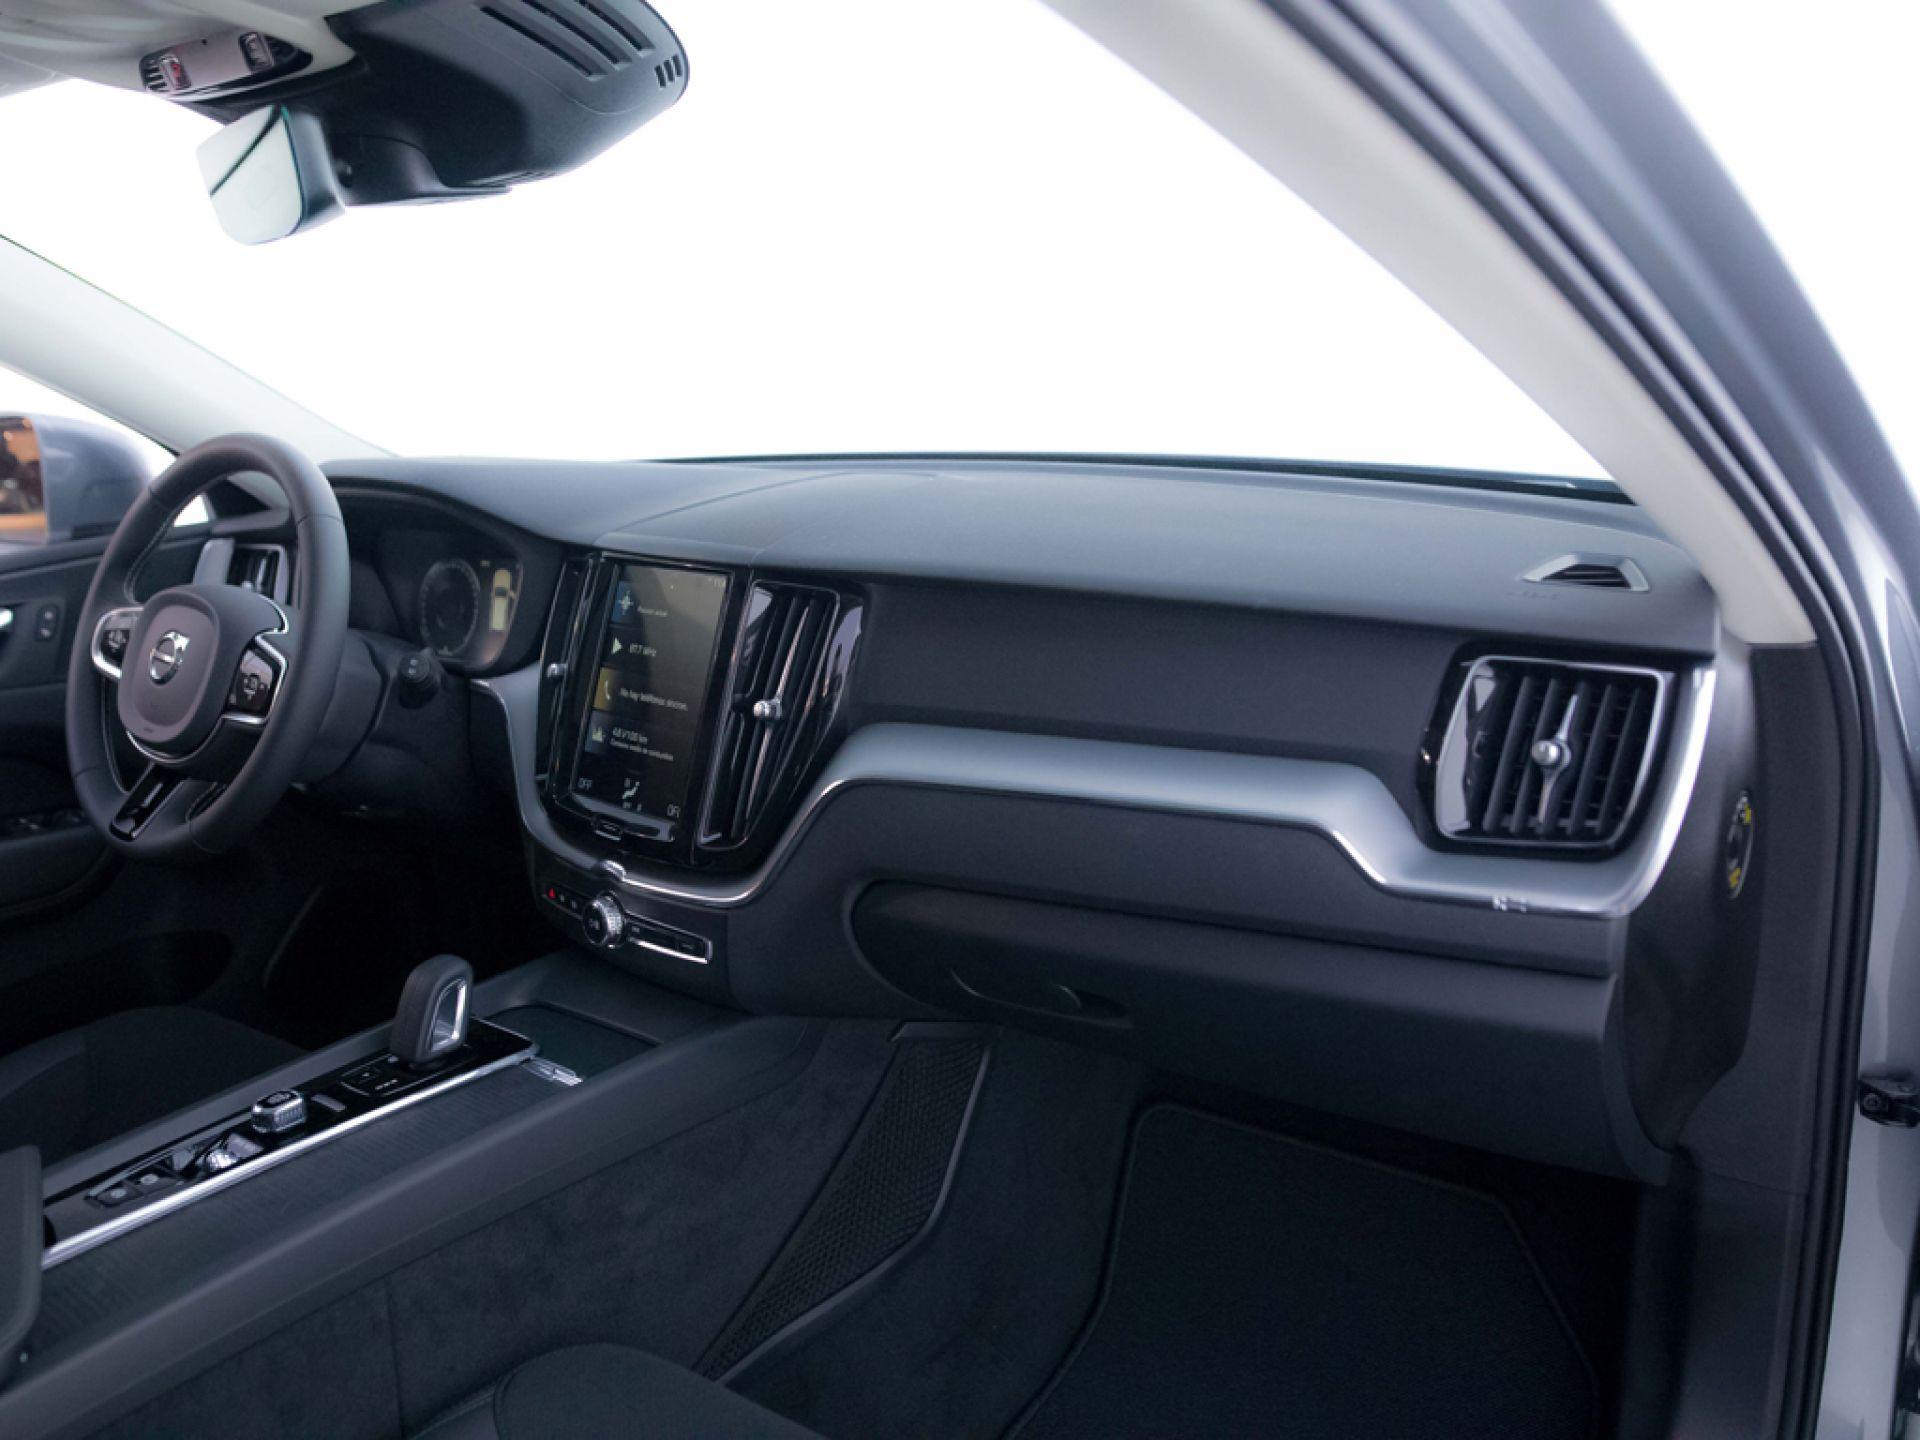 Volvo XC60 2.0 T8 AWD Business Plus Auto